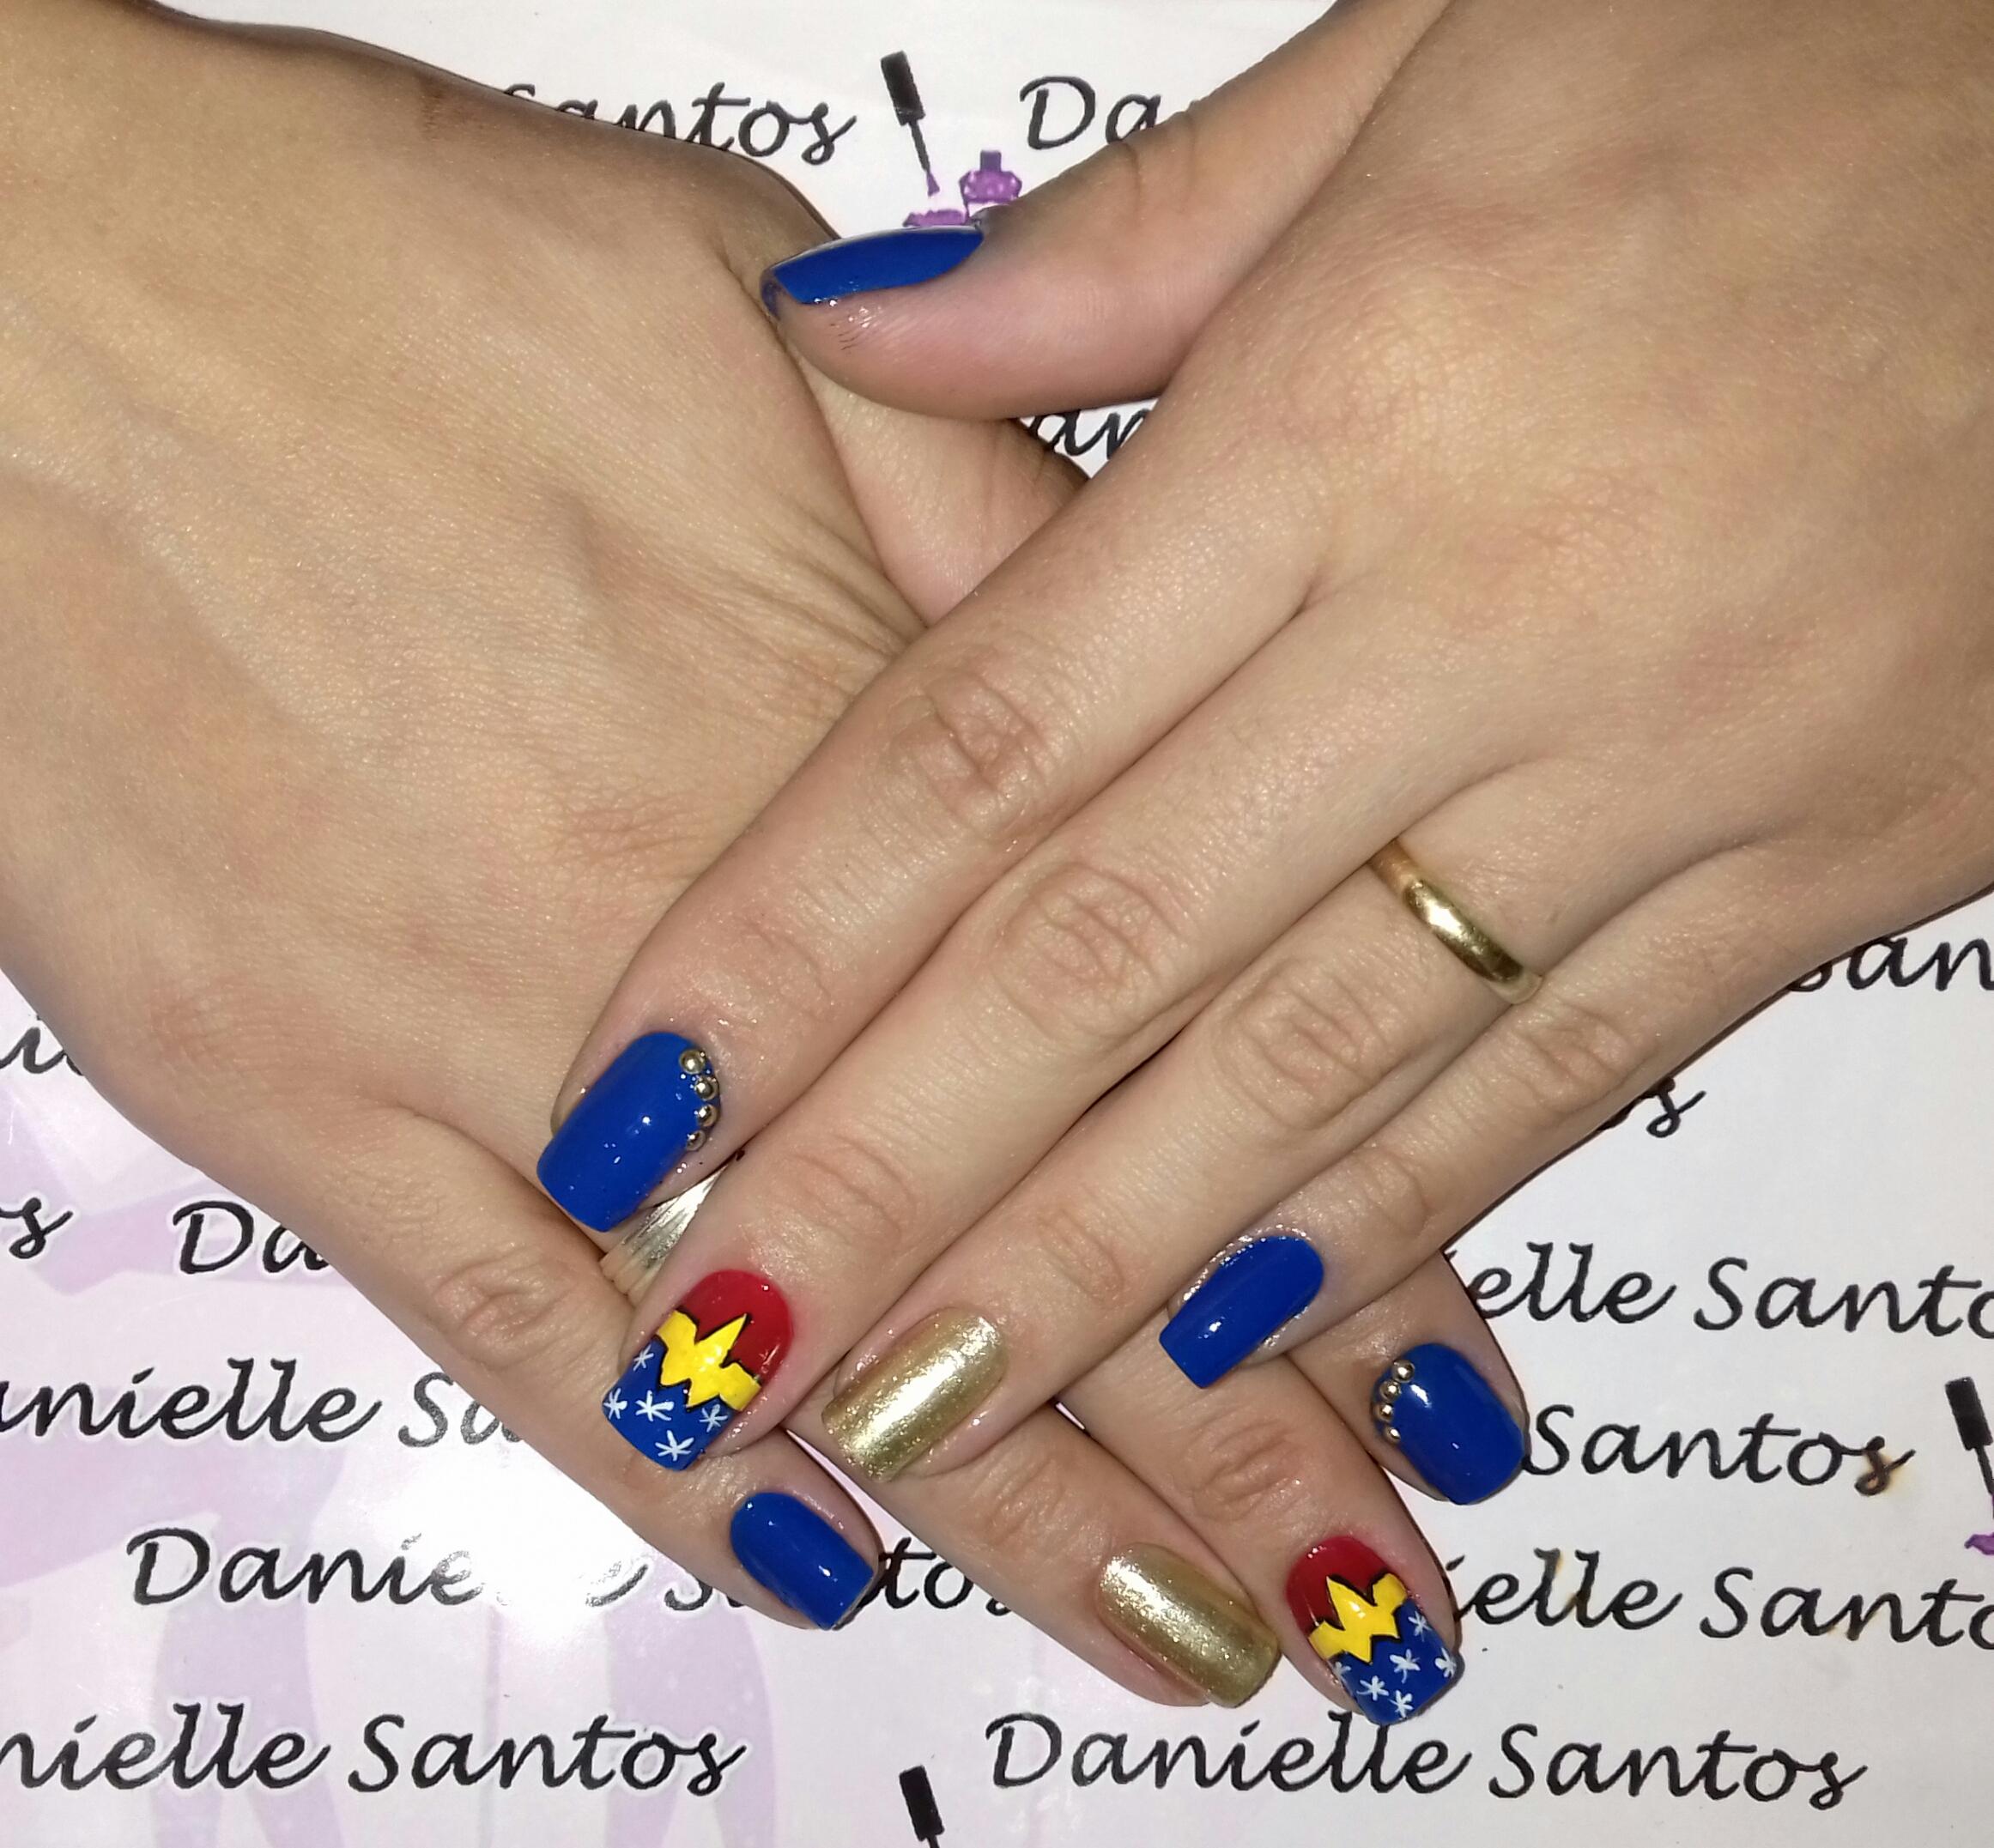 #Mulhermaravilha #naildesign unha manicure e pedicure